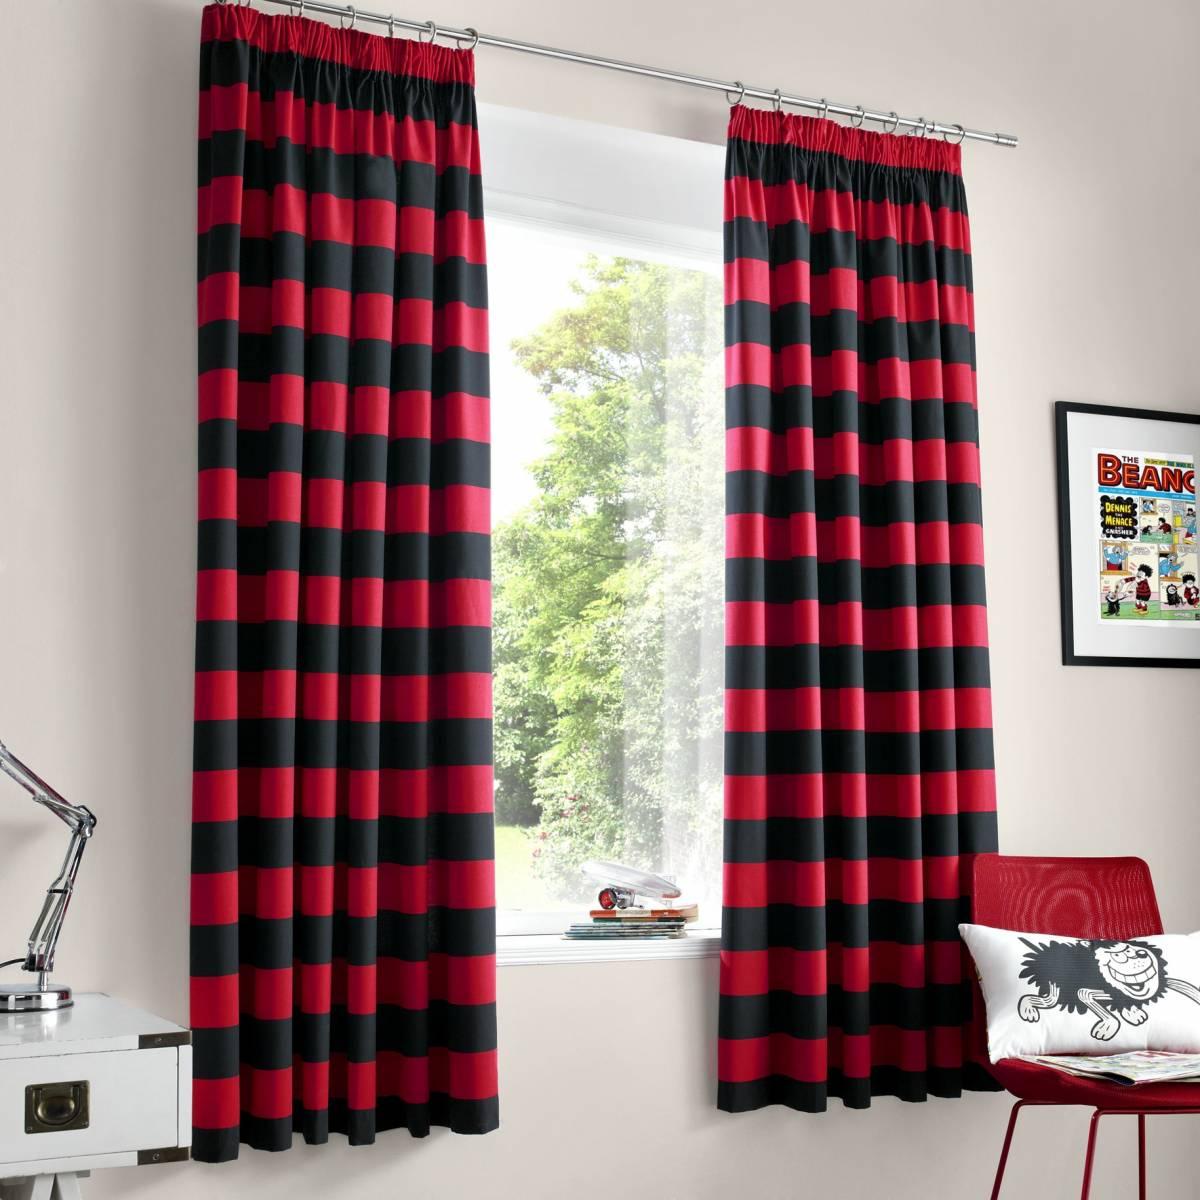 1361300748-45781600 20+ Hottest Curtain Design Ideas for 2021